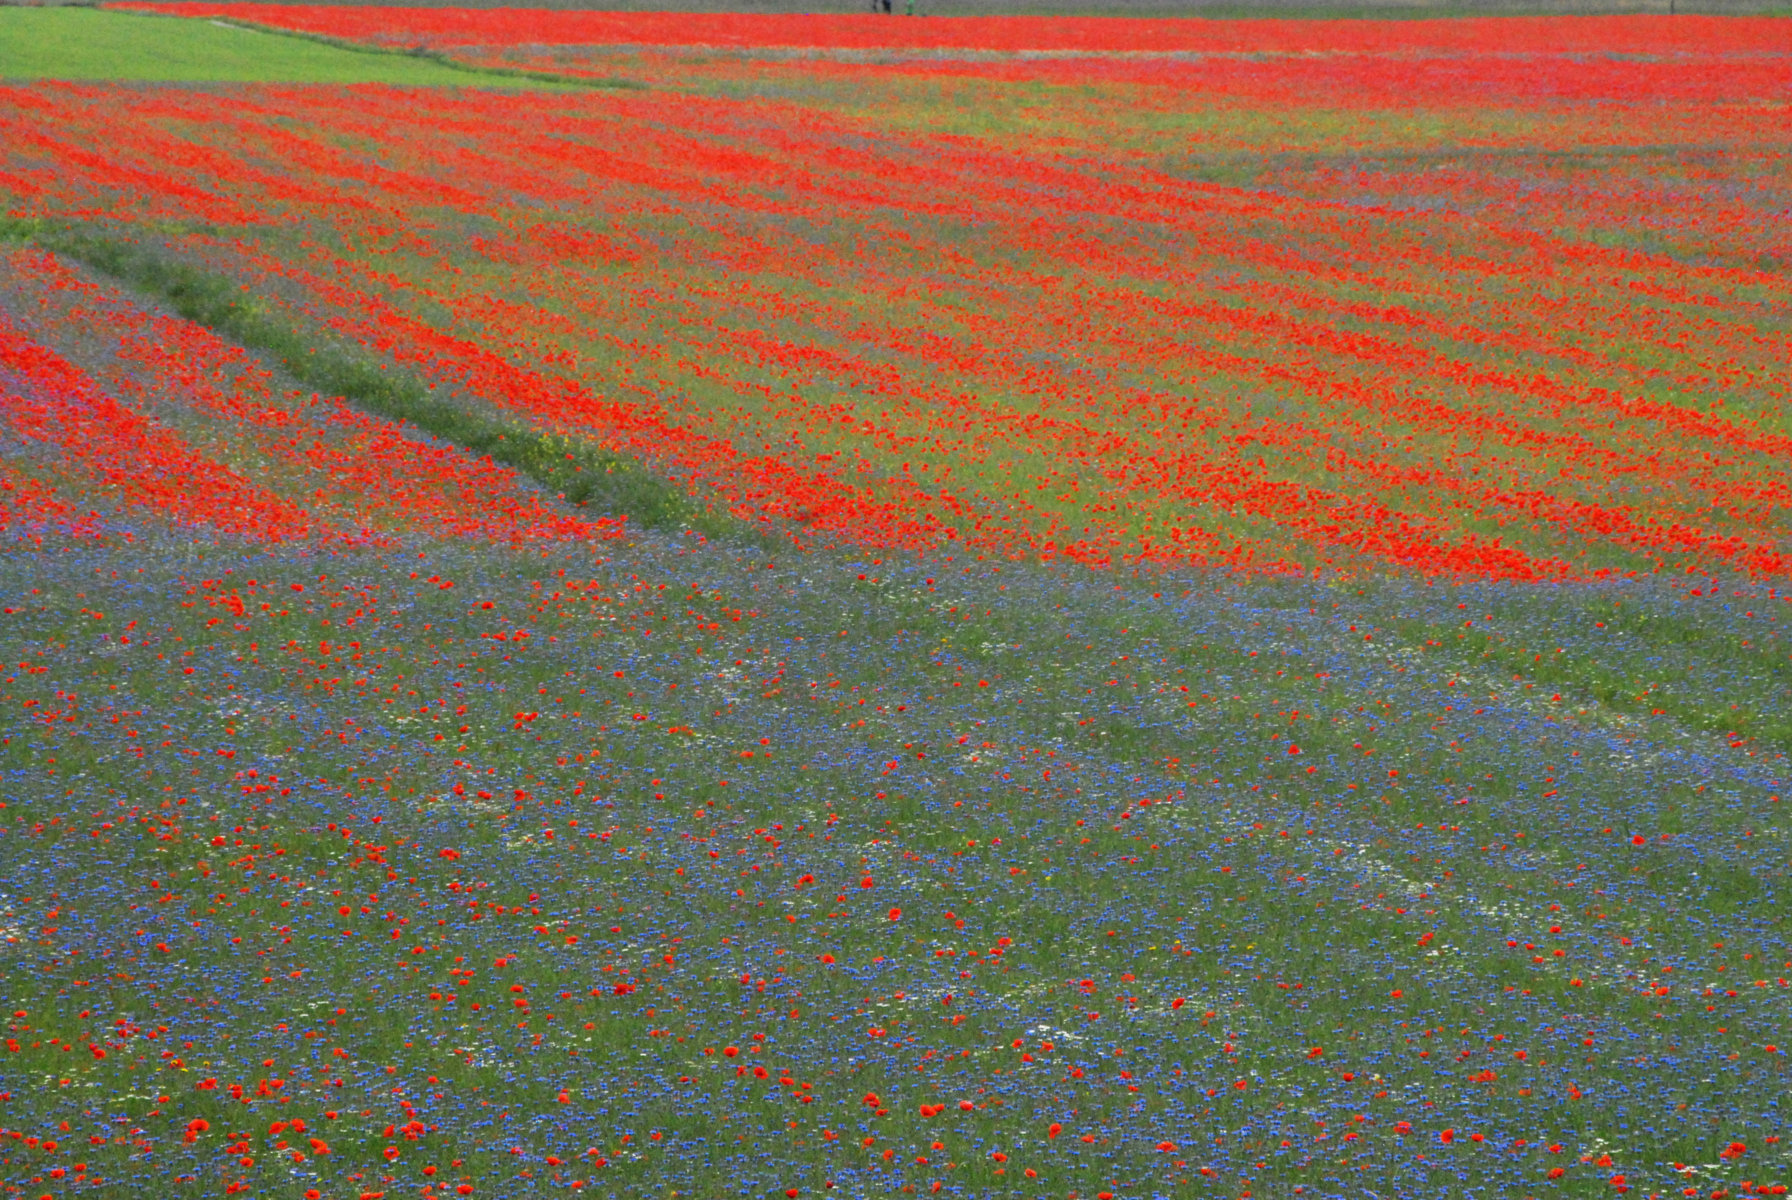 2014-la-fiorita-1a-442-fileminimizer